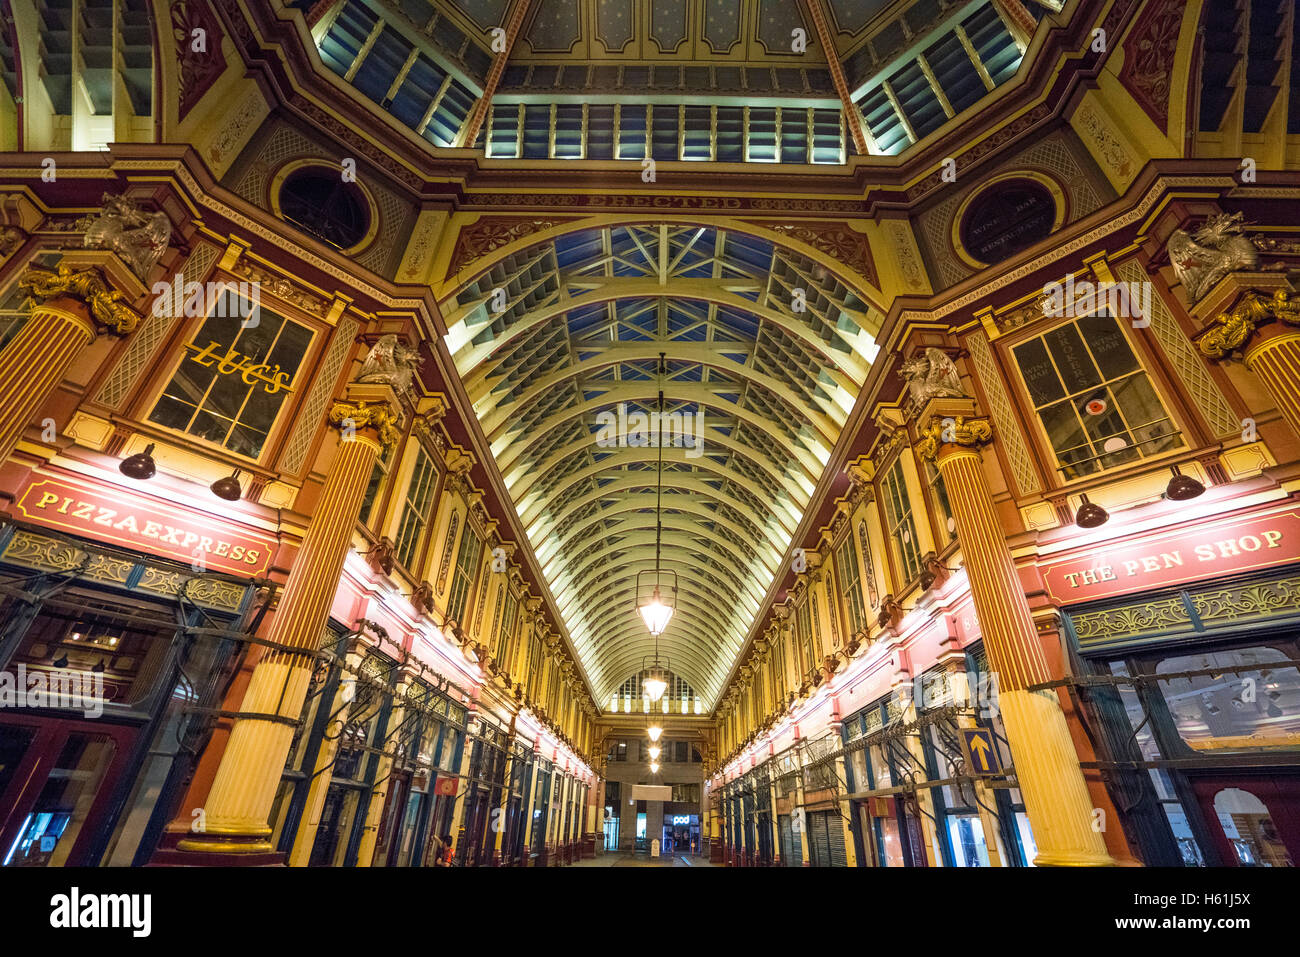 Popular tourist attraction in London - Leadenhall Market - Stock Image